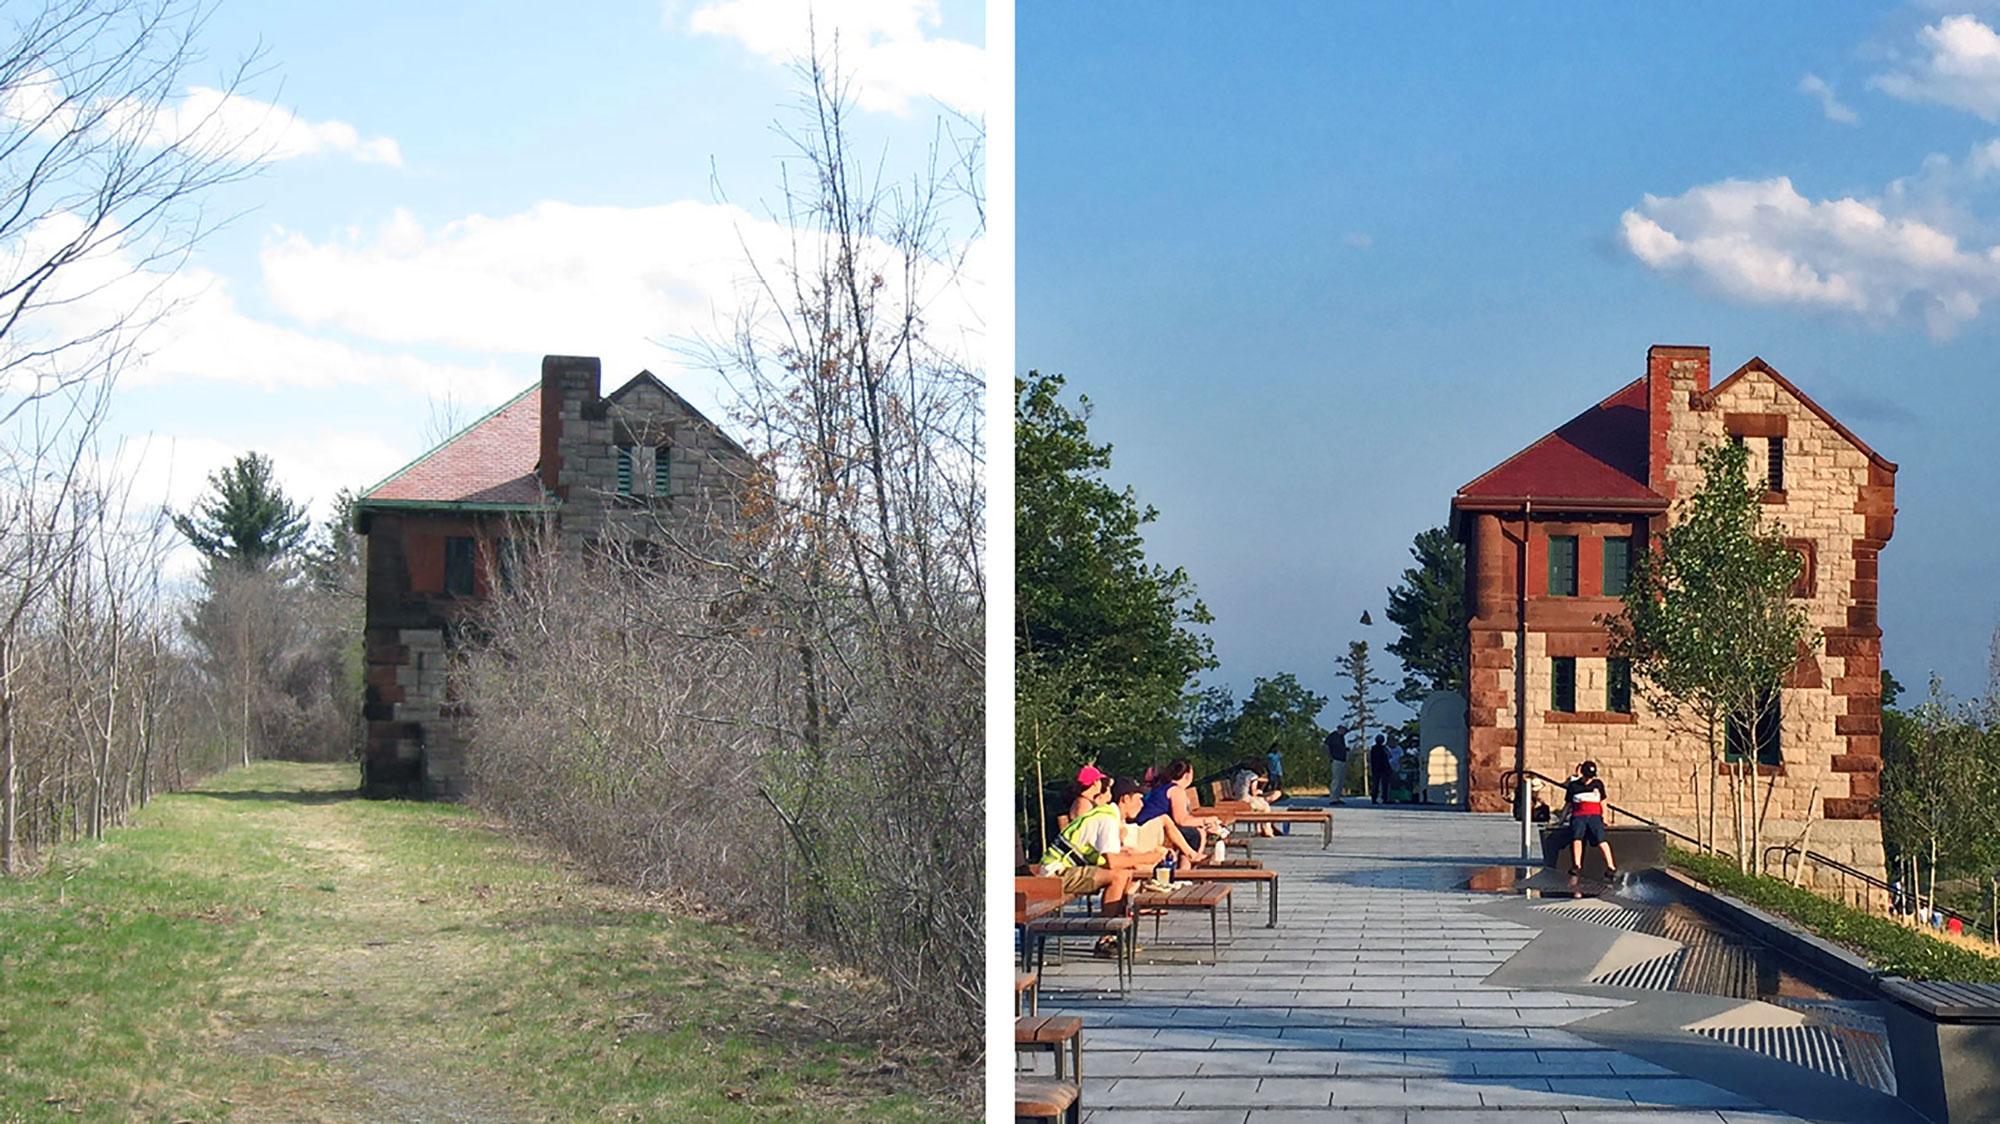 Fisher Hill Reservoir Park – AIA NE Merit Award for Historic Preservation + Adaptive Reuse*